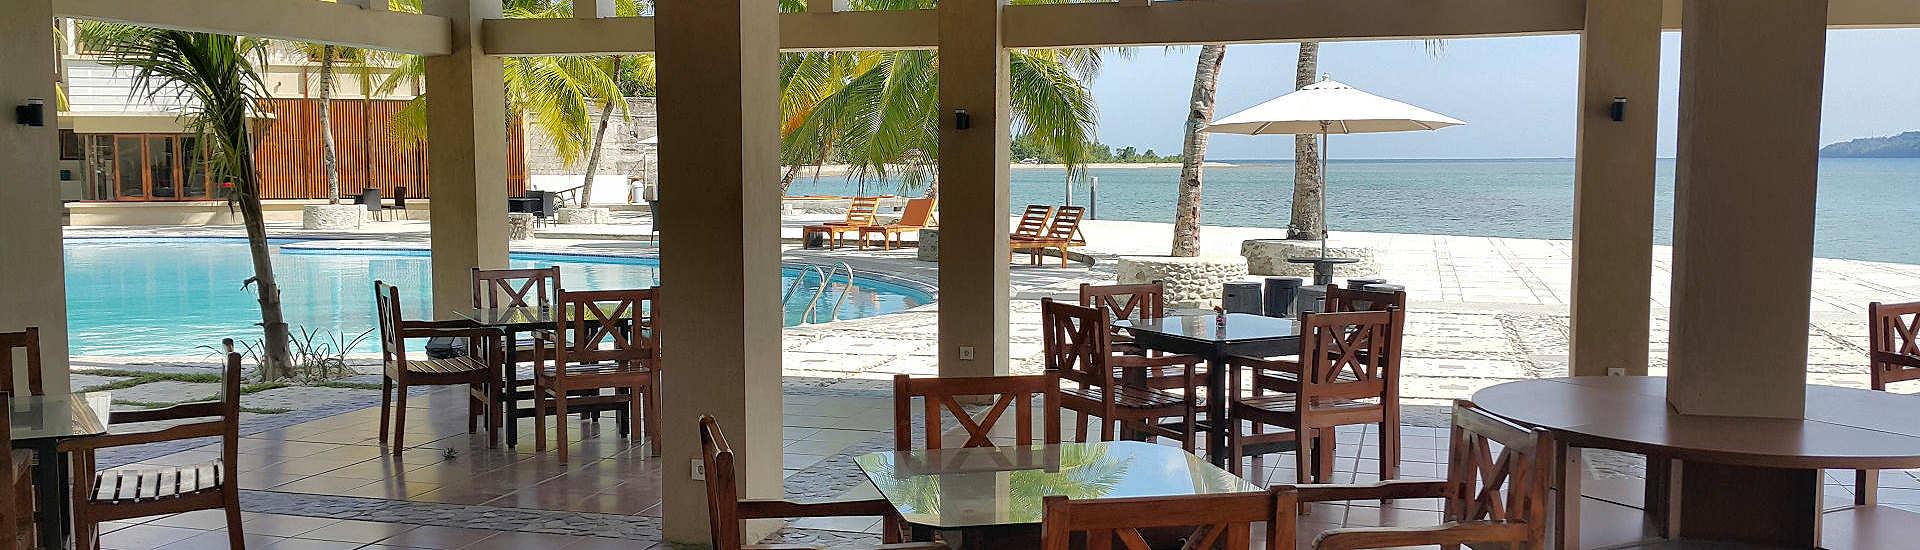 offenes Restaurant am Pool, Maluku Dive Resort